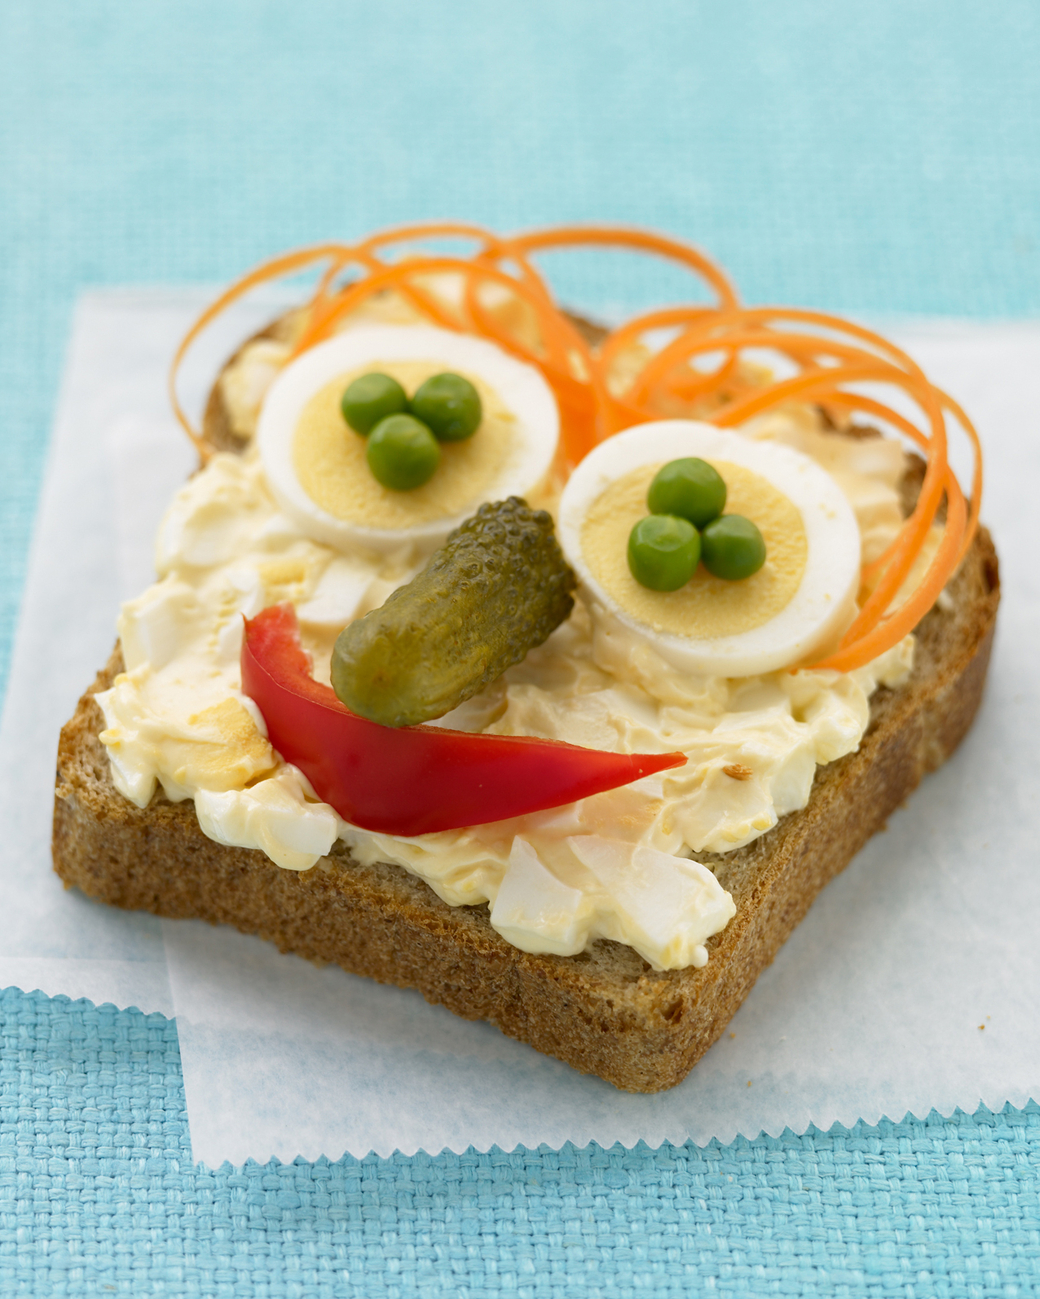 How to make Egg Salad-5 Easy Egg Salad Recipes